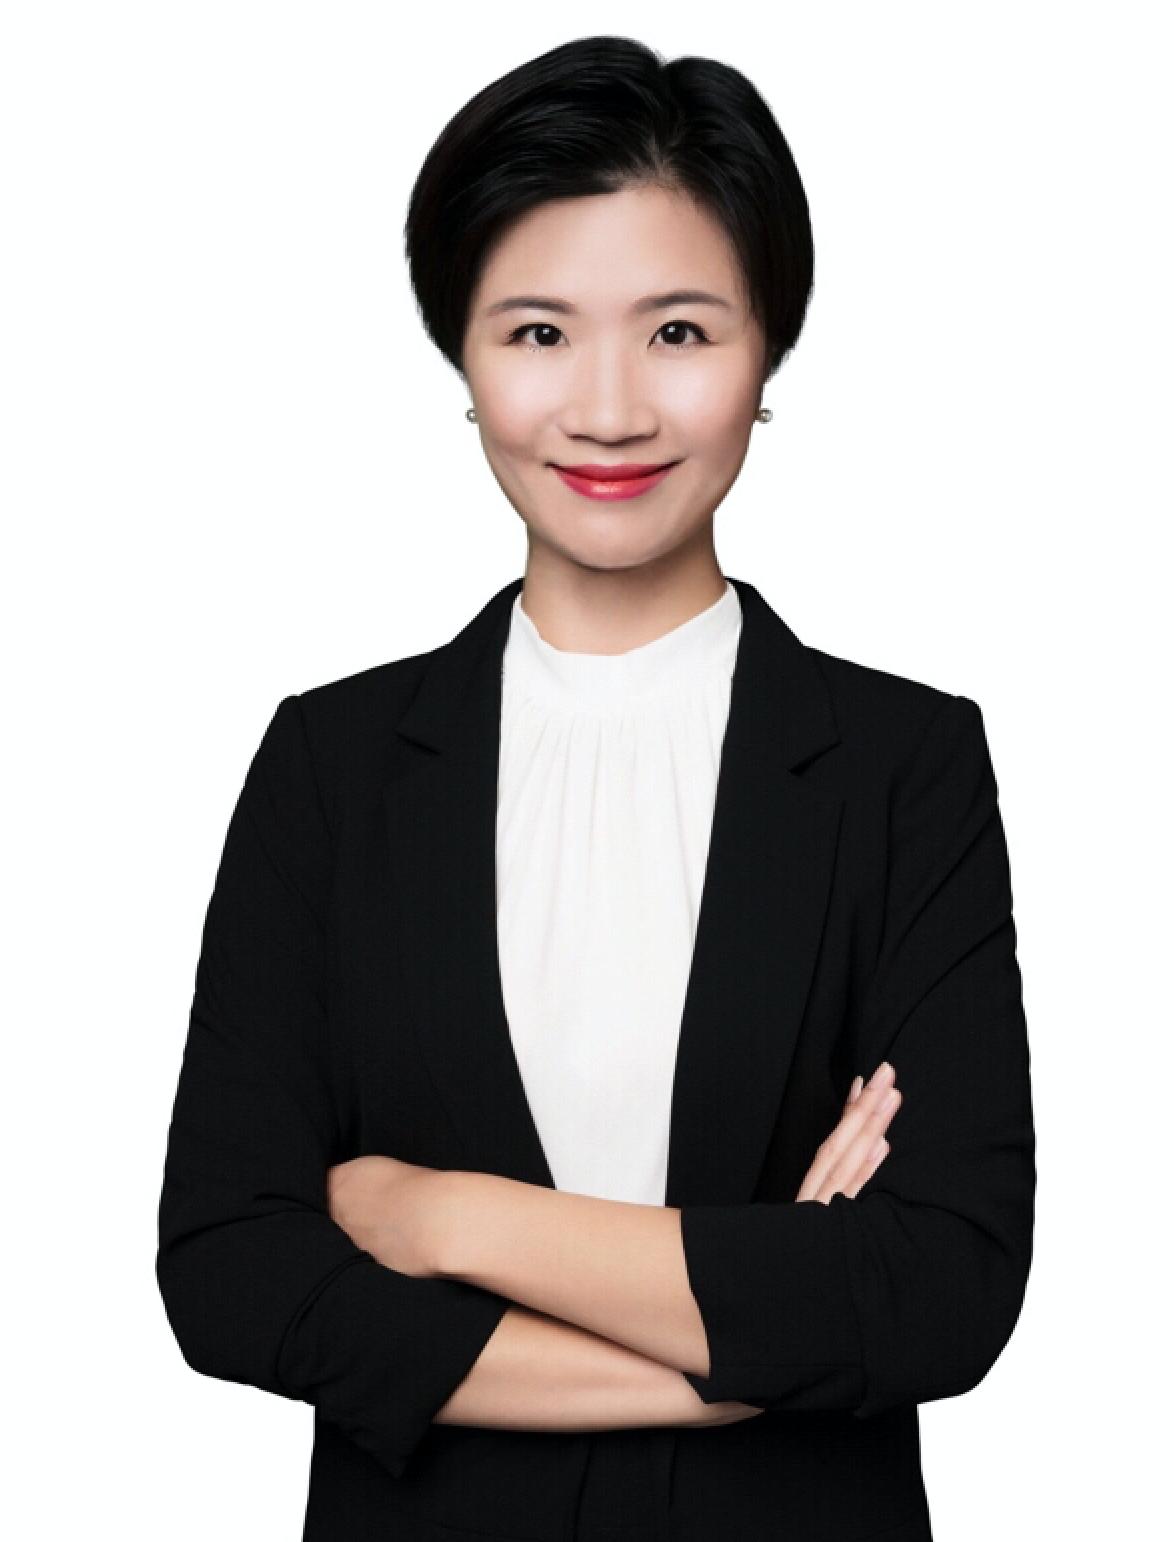 Chloe Huang